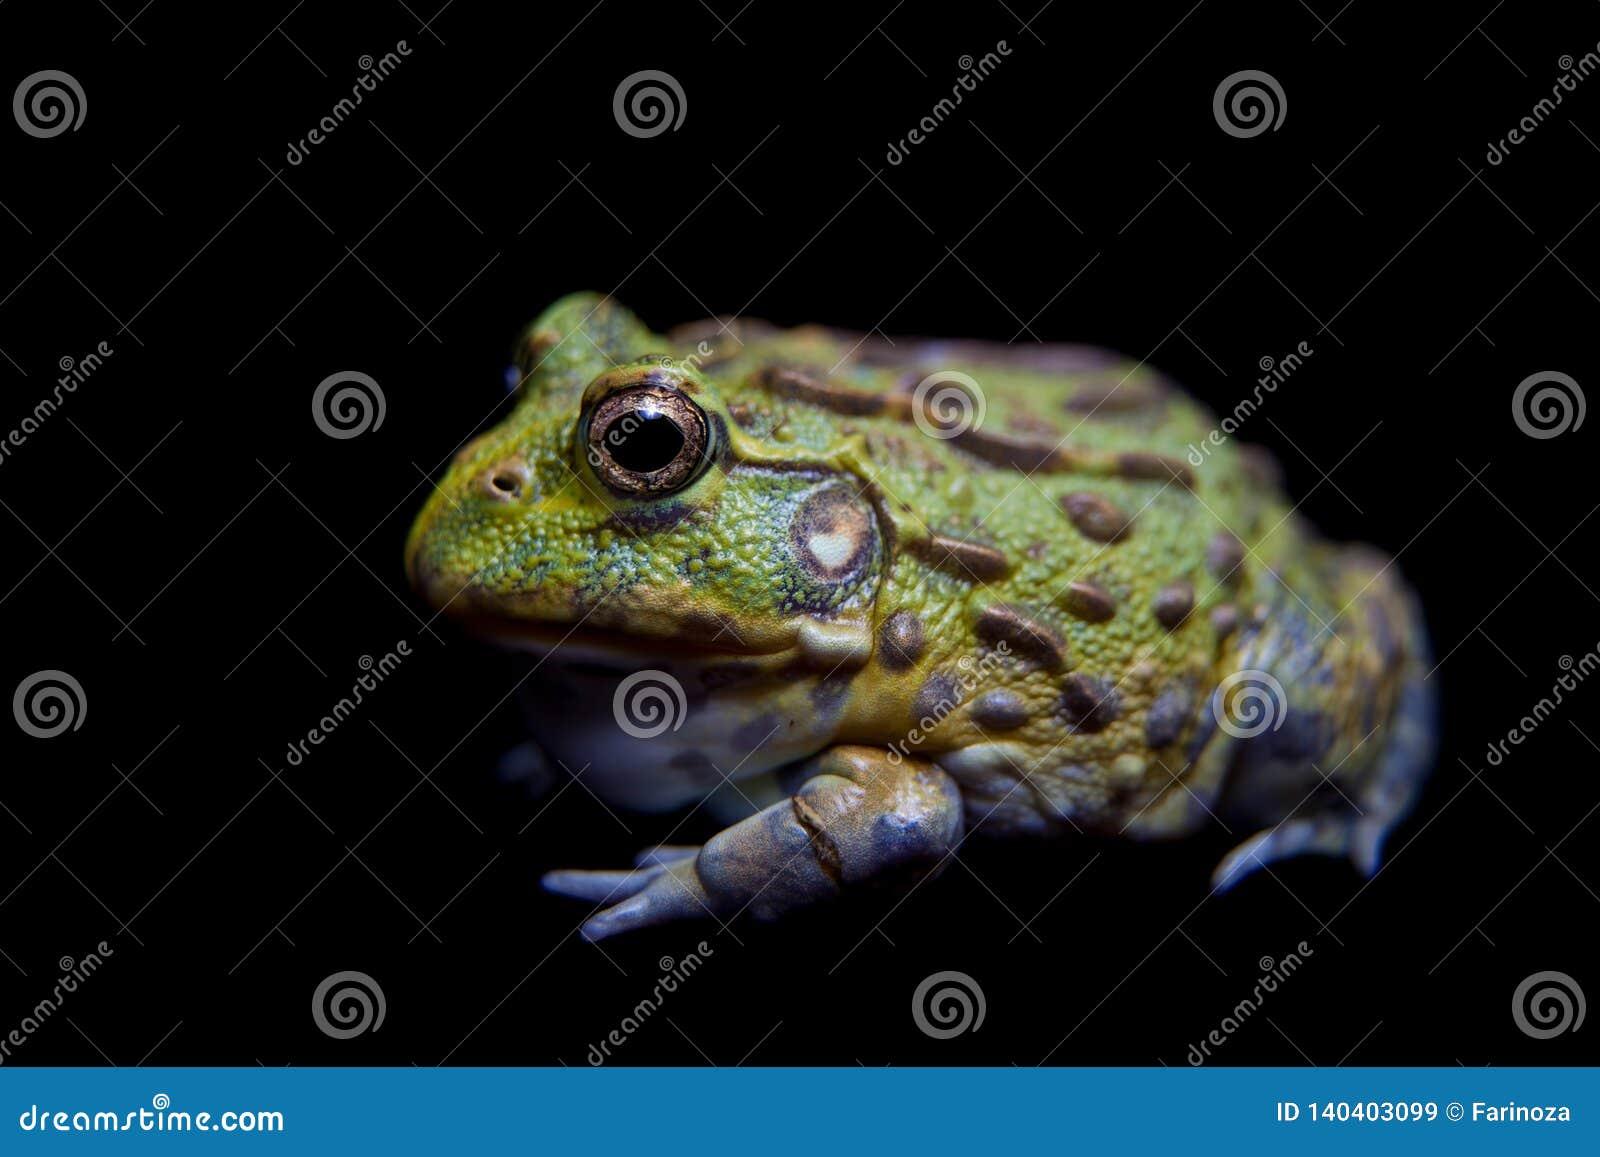 The African bullfrog on black